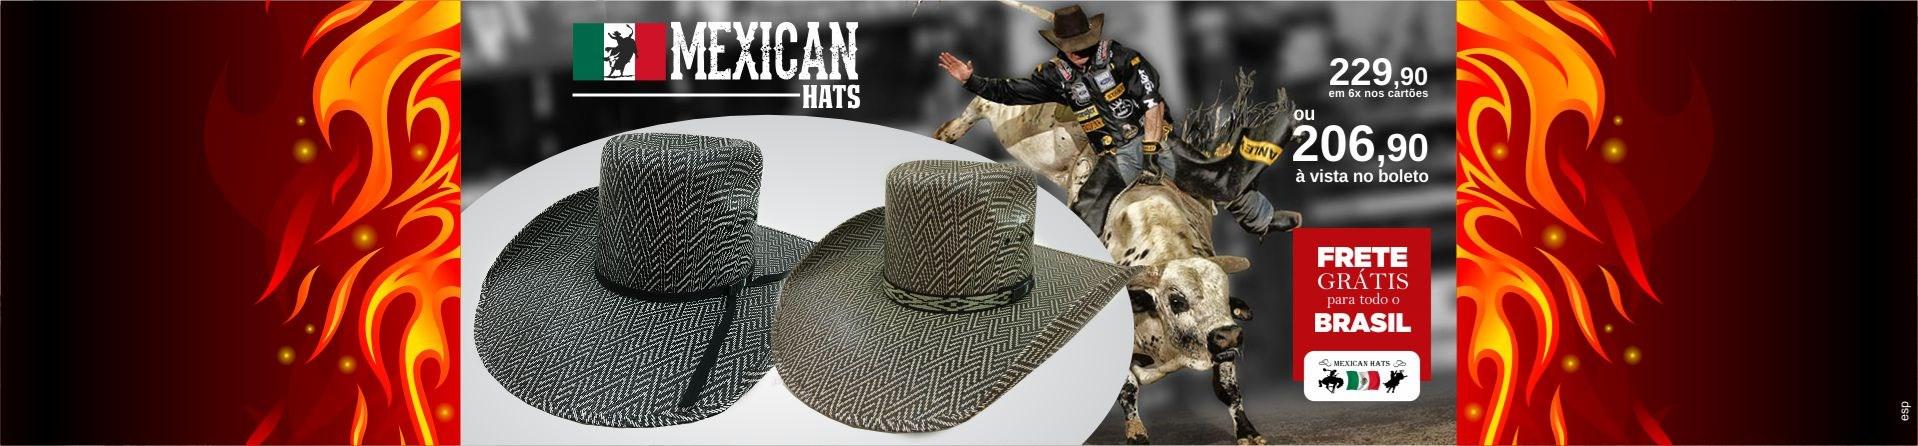 mexican frete gratis